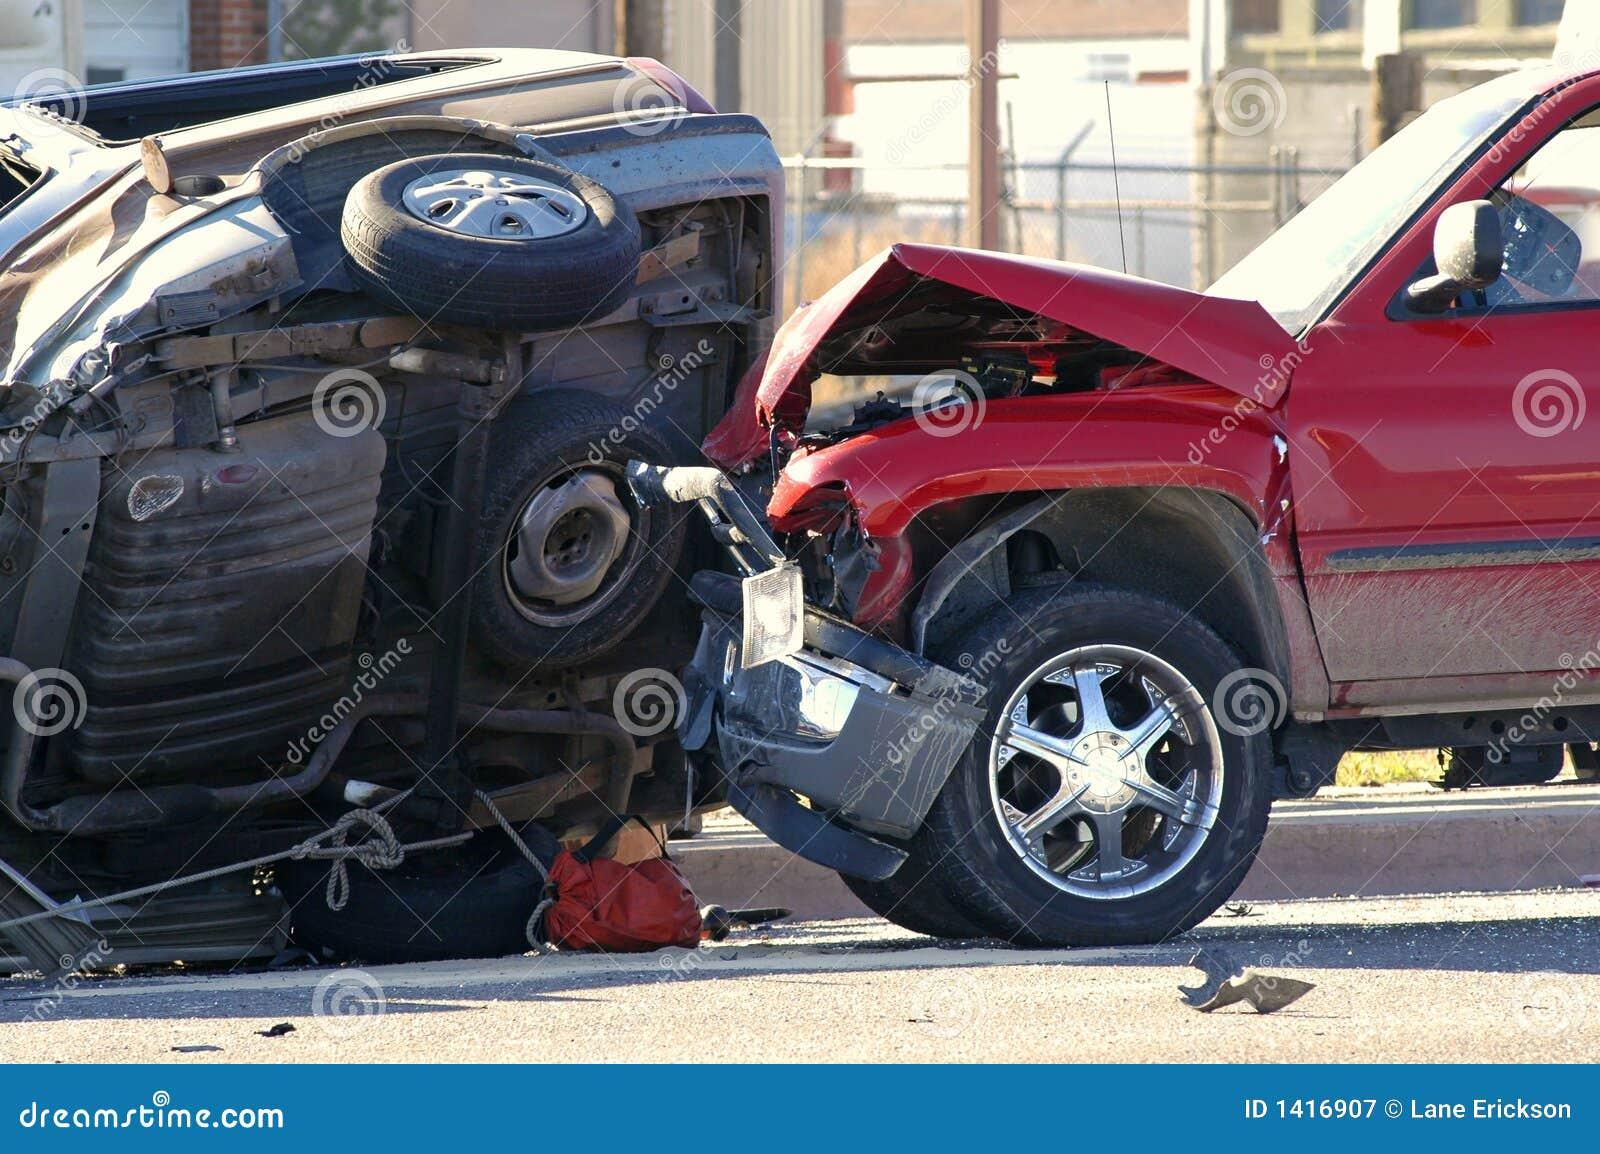 Autounfall stockbild. Bild von gebrochen, auto, zertrümmert - 1416907